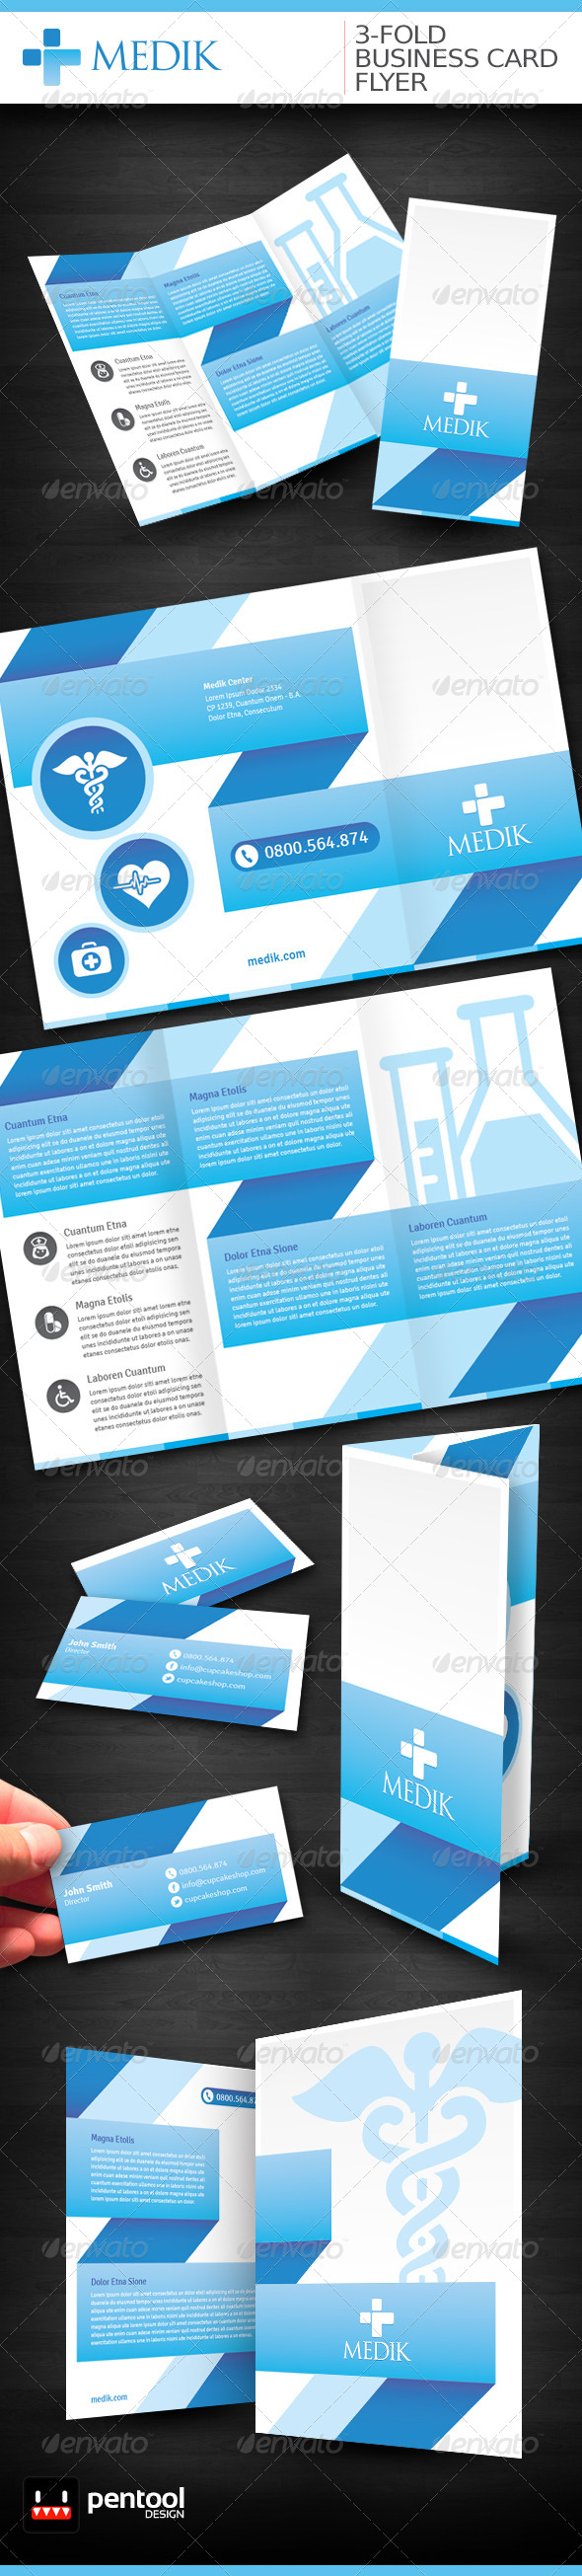 Medik 3-Fold/Business Card/Flyer  - Stationery Print Templates